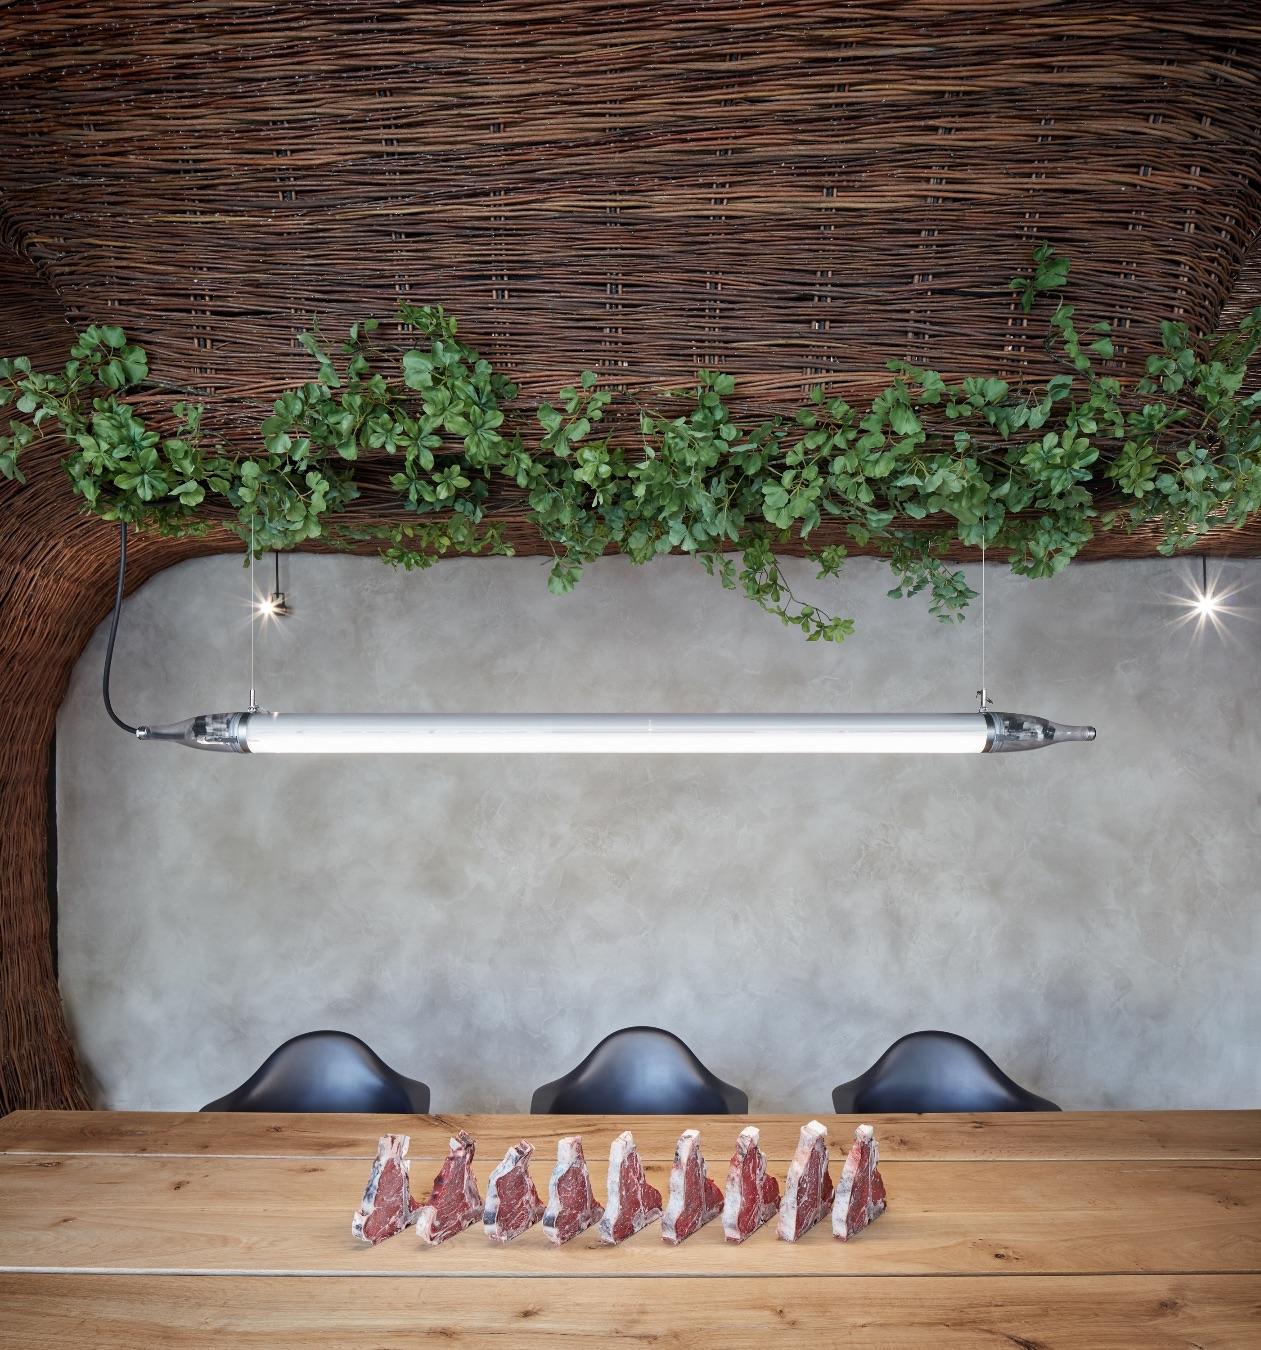 14_Komplits_STK Restaurant_Inspirationist